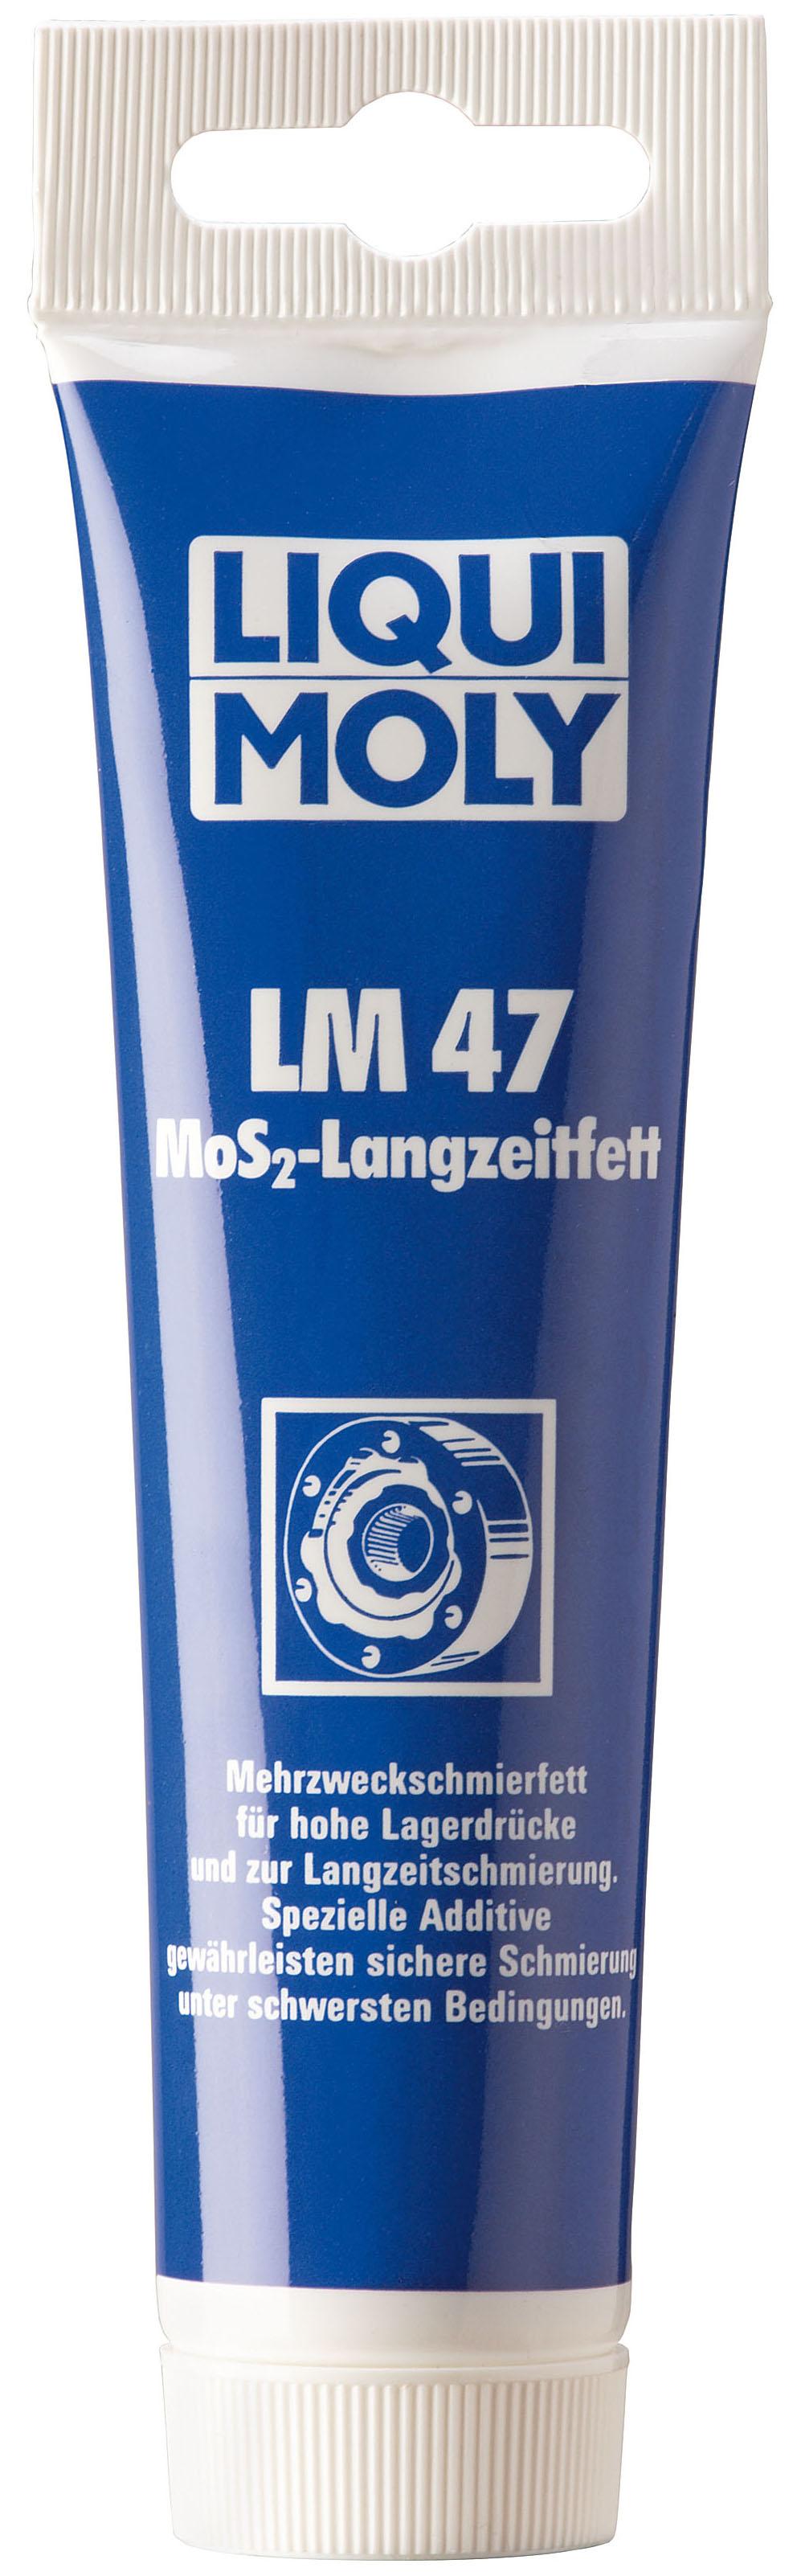 Liqui Moly LM 47 Langzeitfett